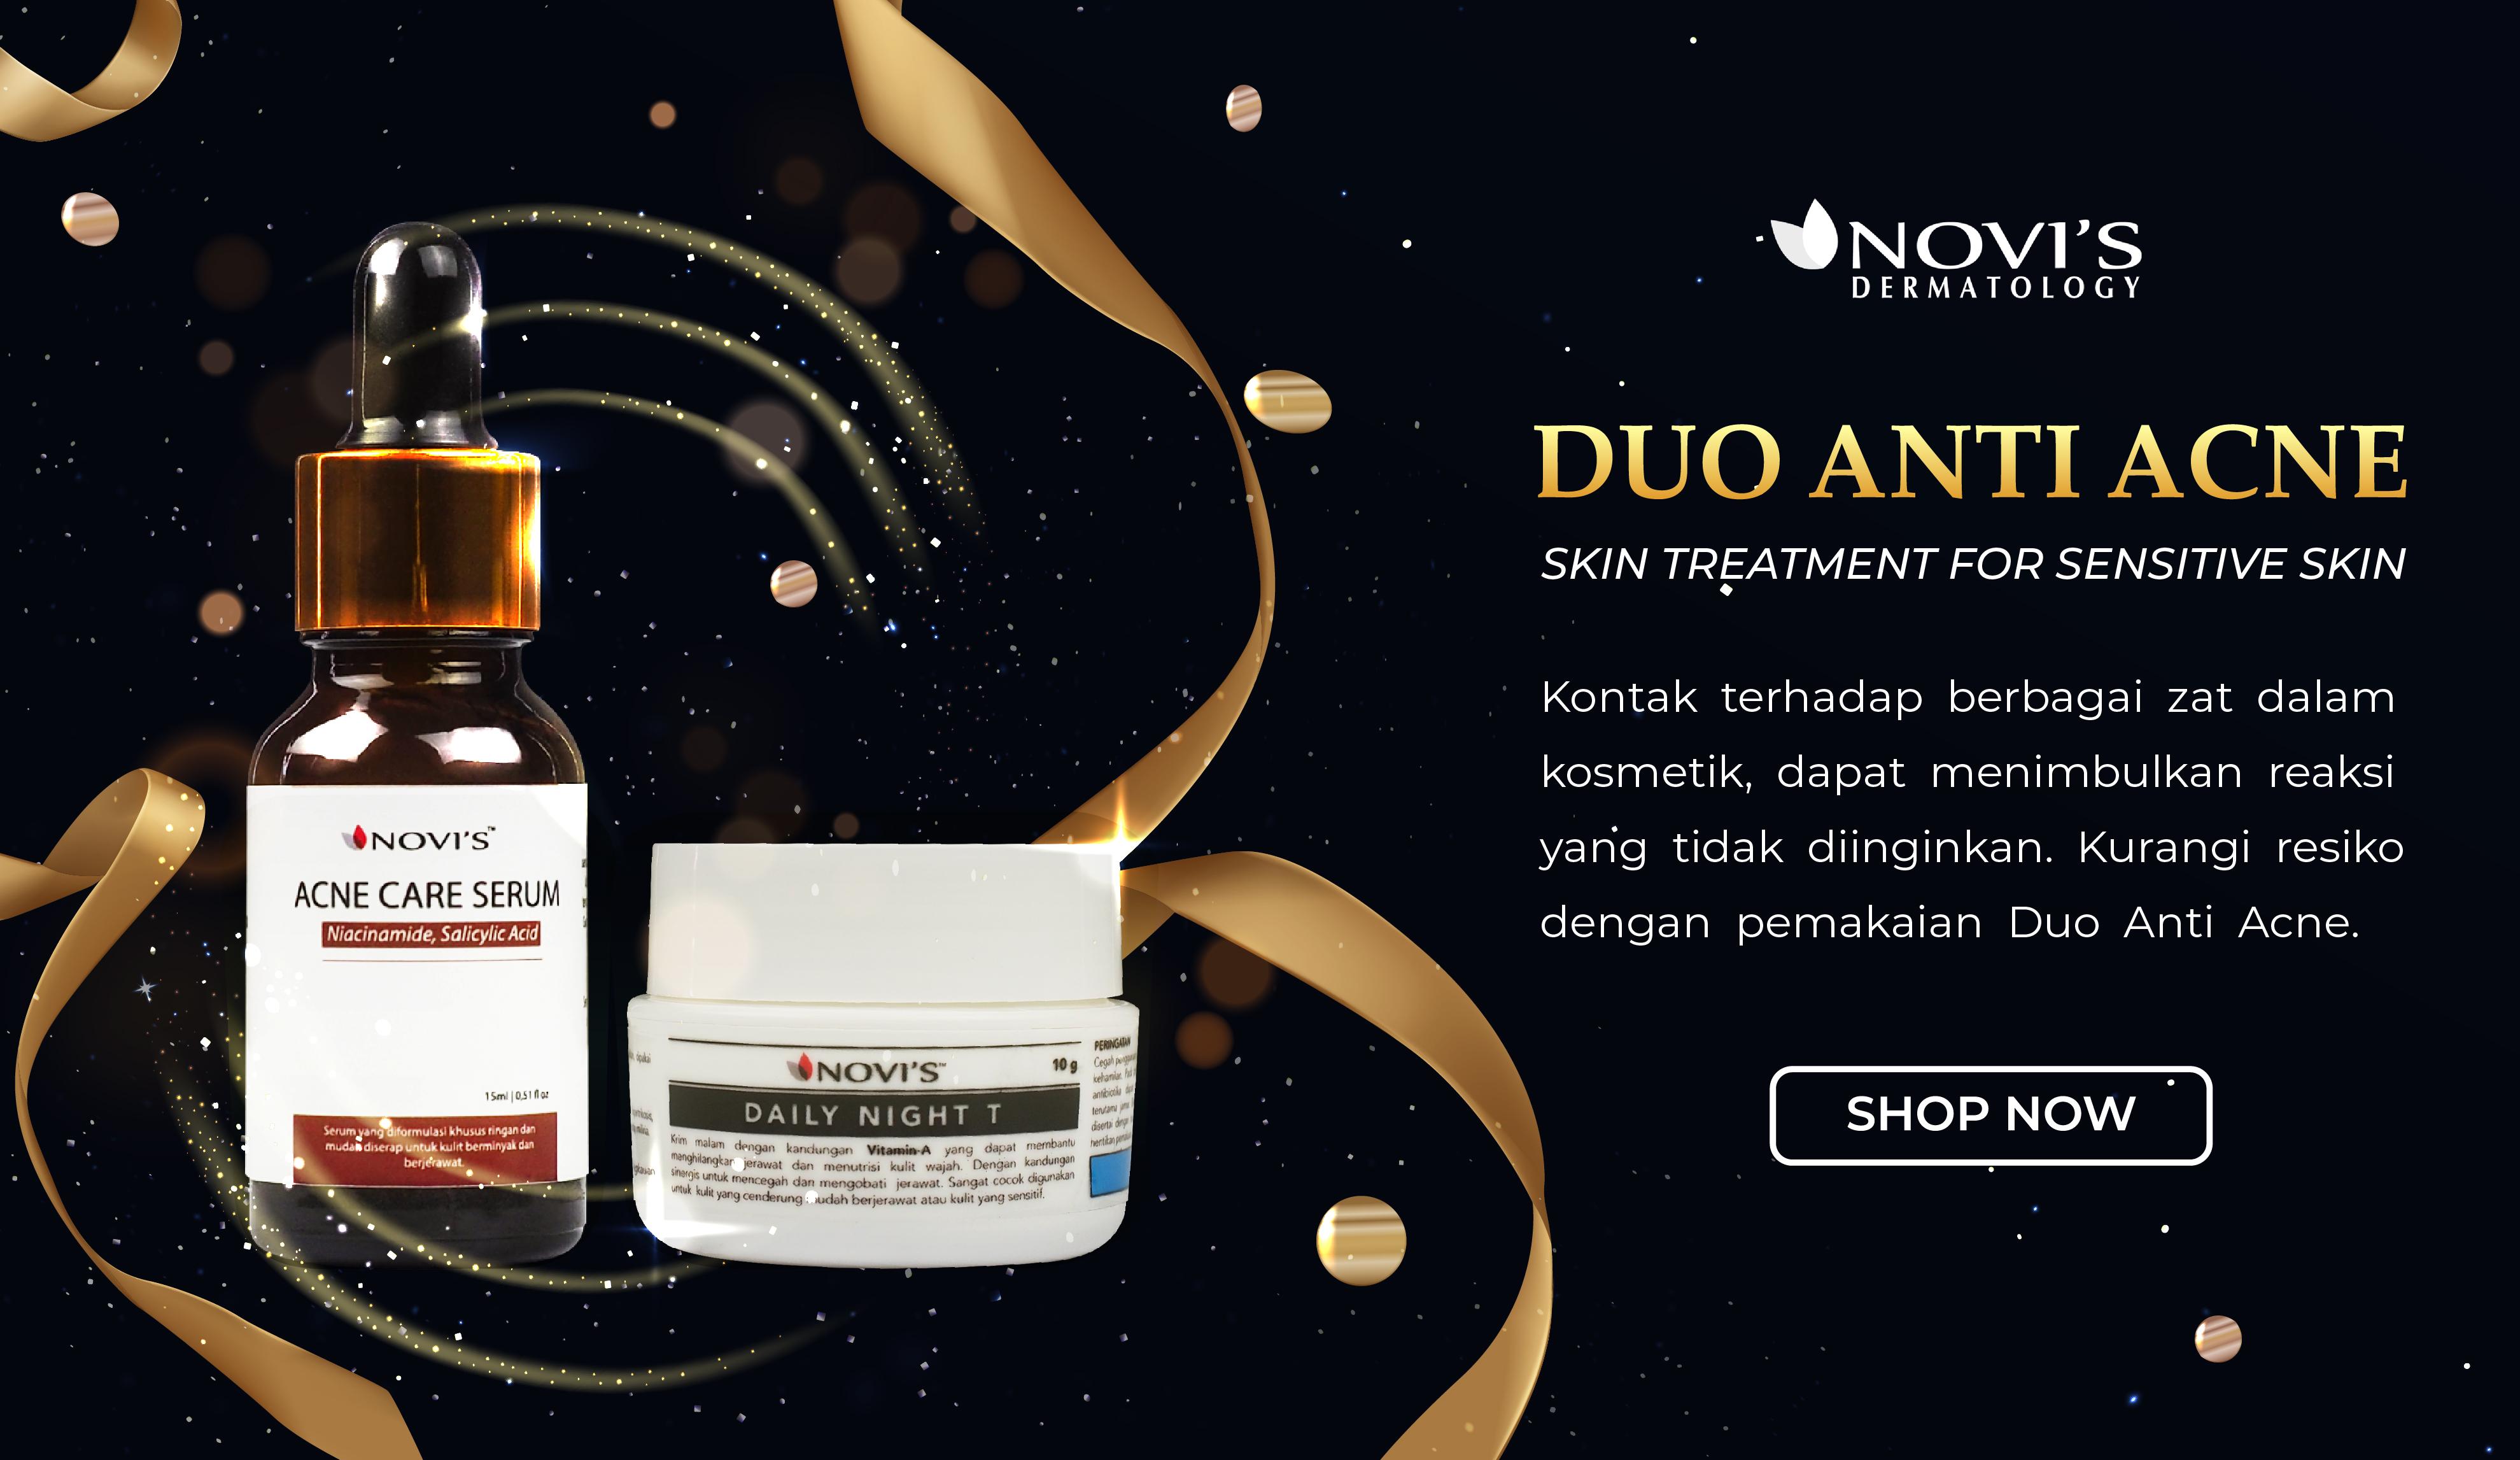 NOVIS - Duo Anti Acne